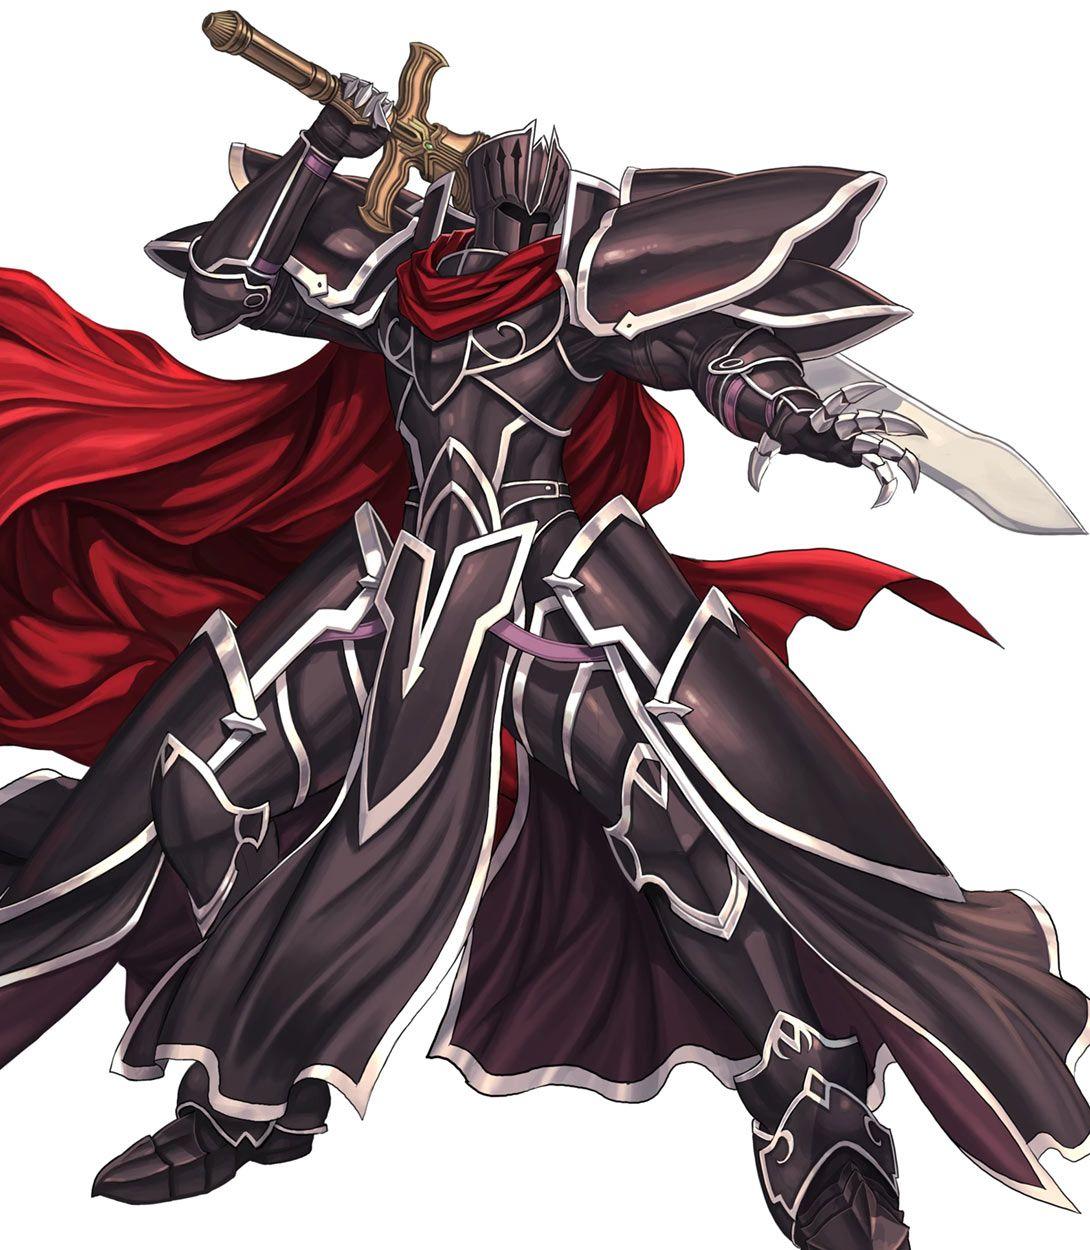 Black knight battle stance knights pinterest knight